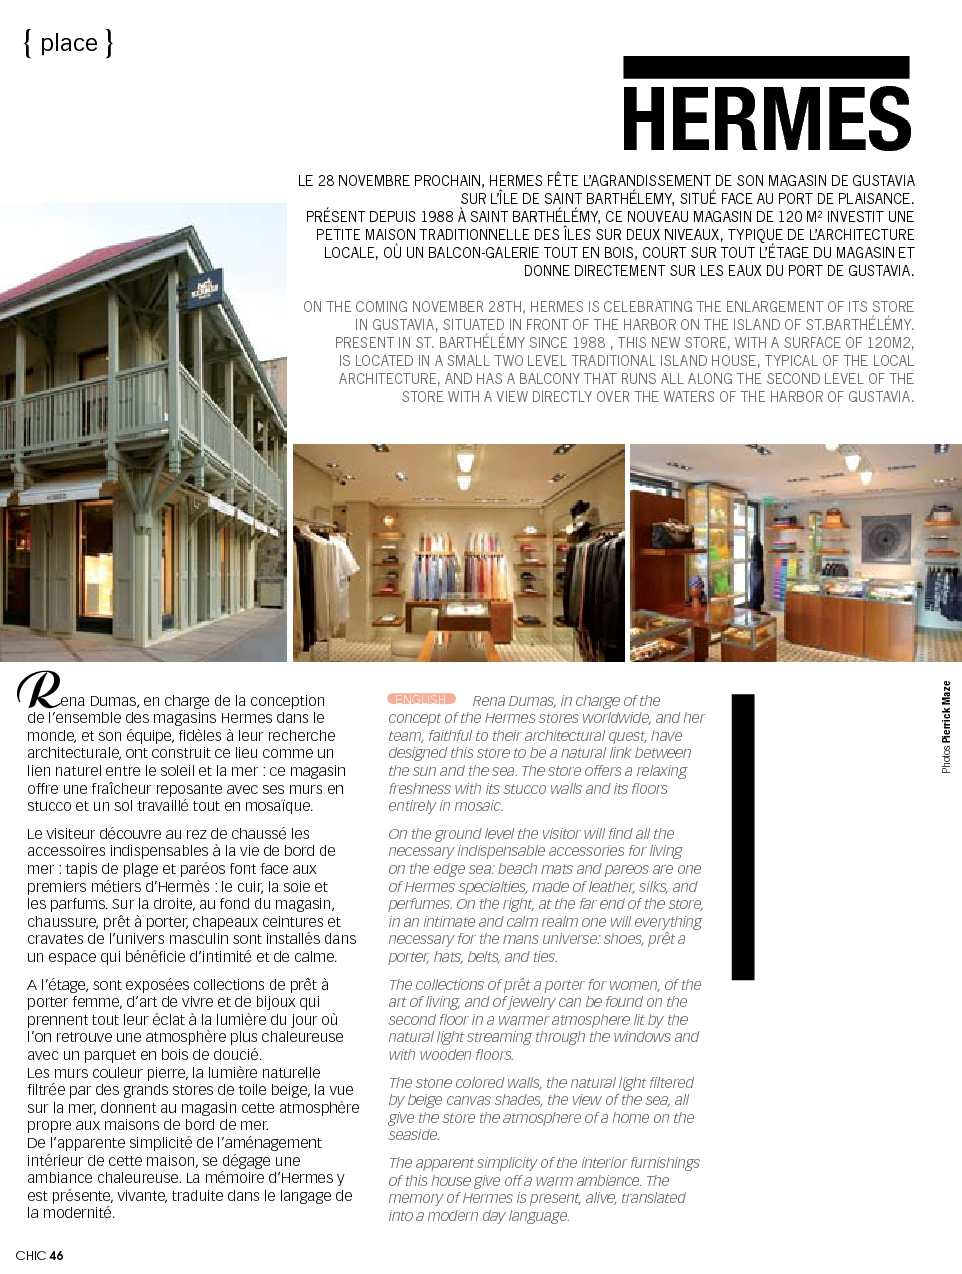 Ambiance Bord De Mer Chic chic st barth magazine - calameo downloader